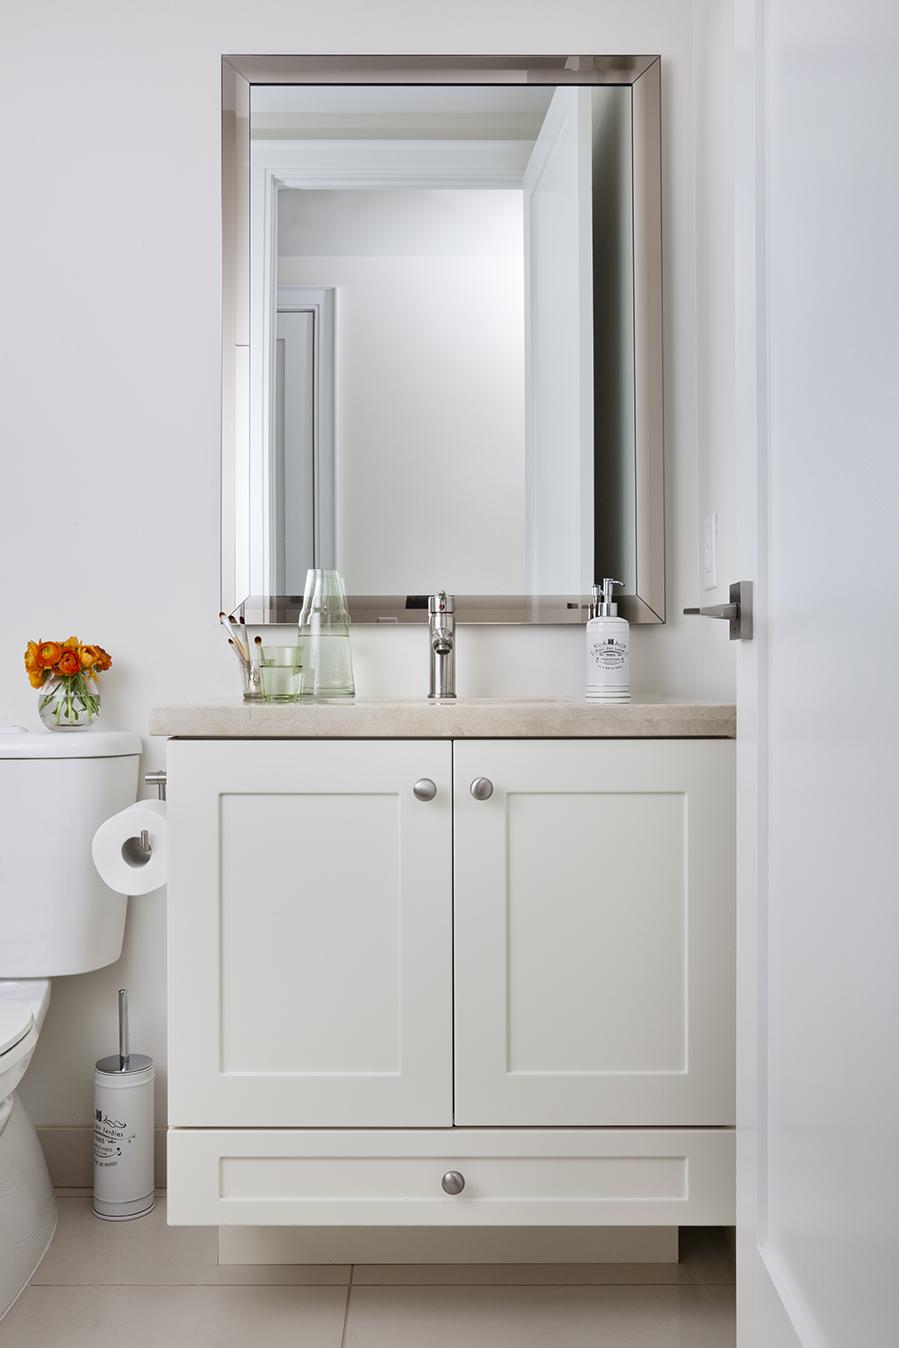 bathroom_1-003-2_final.jpg